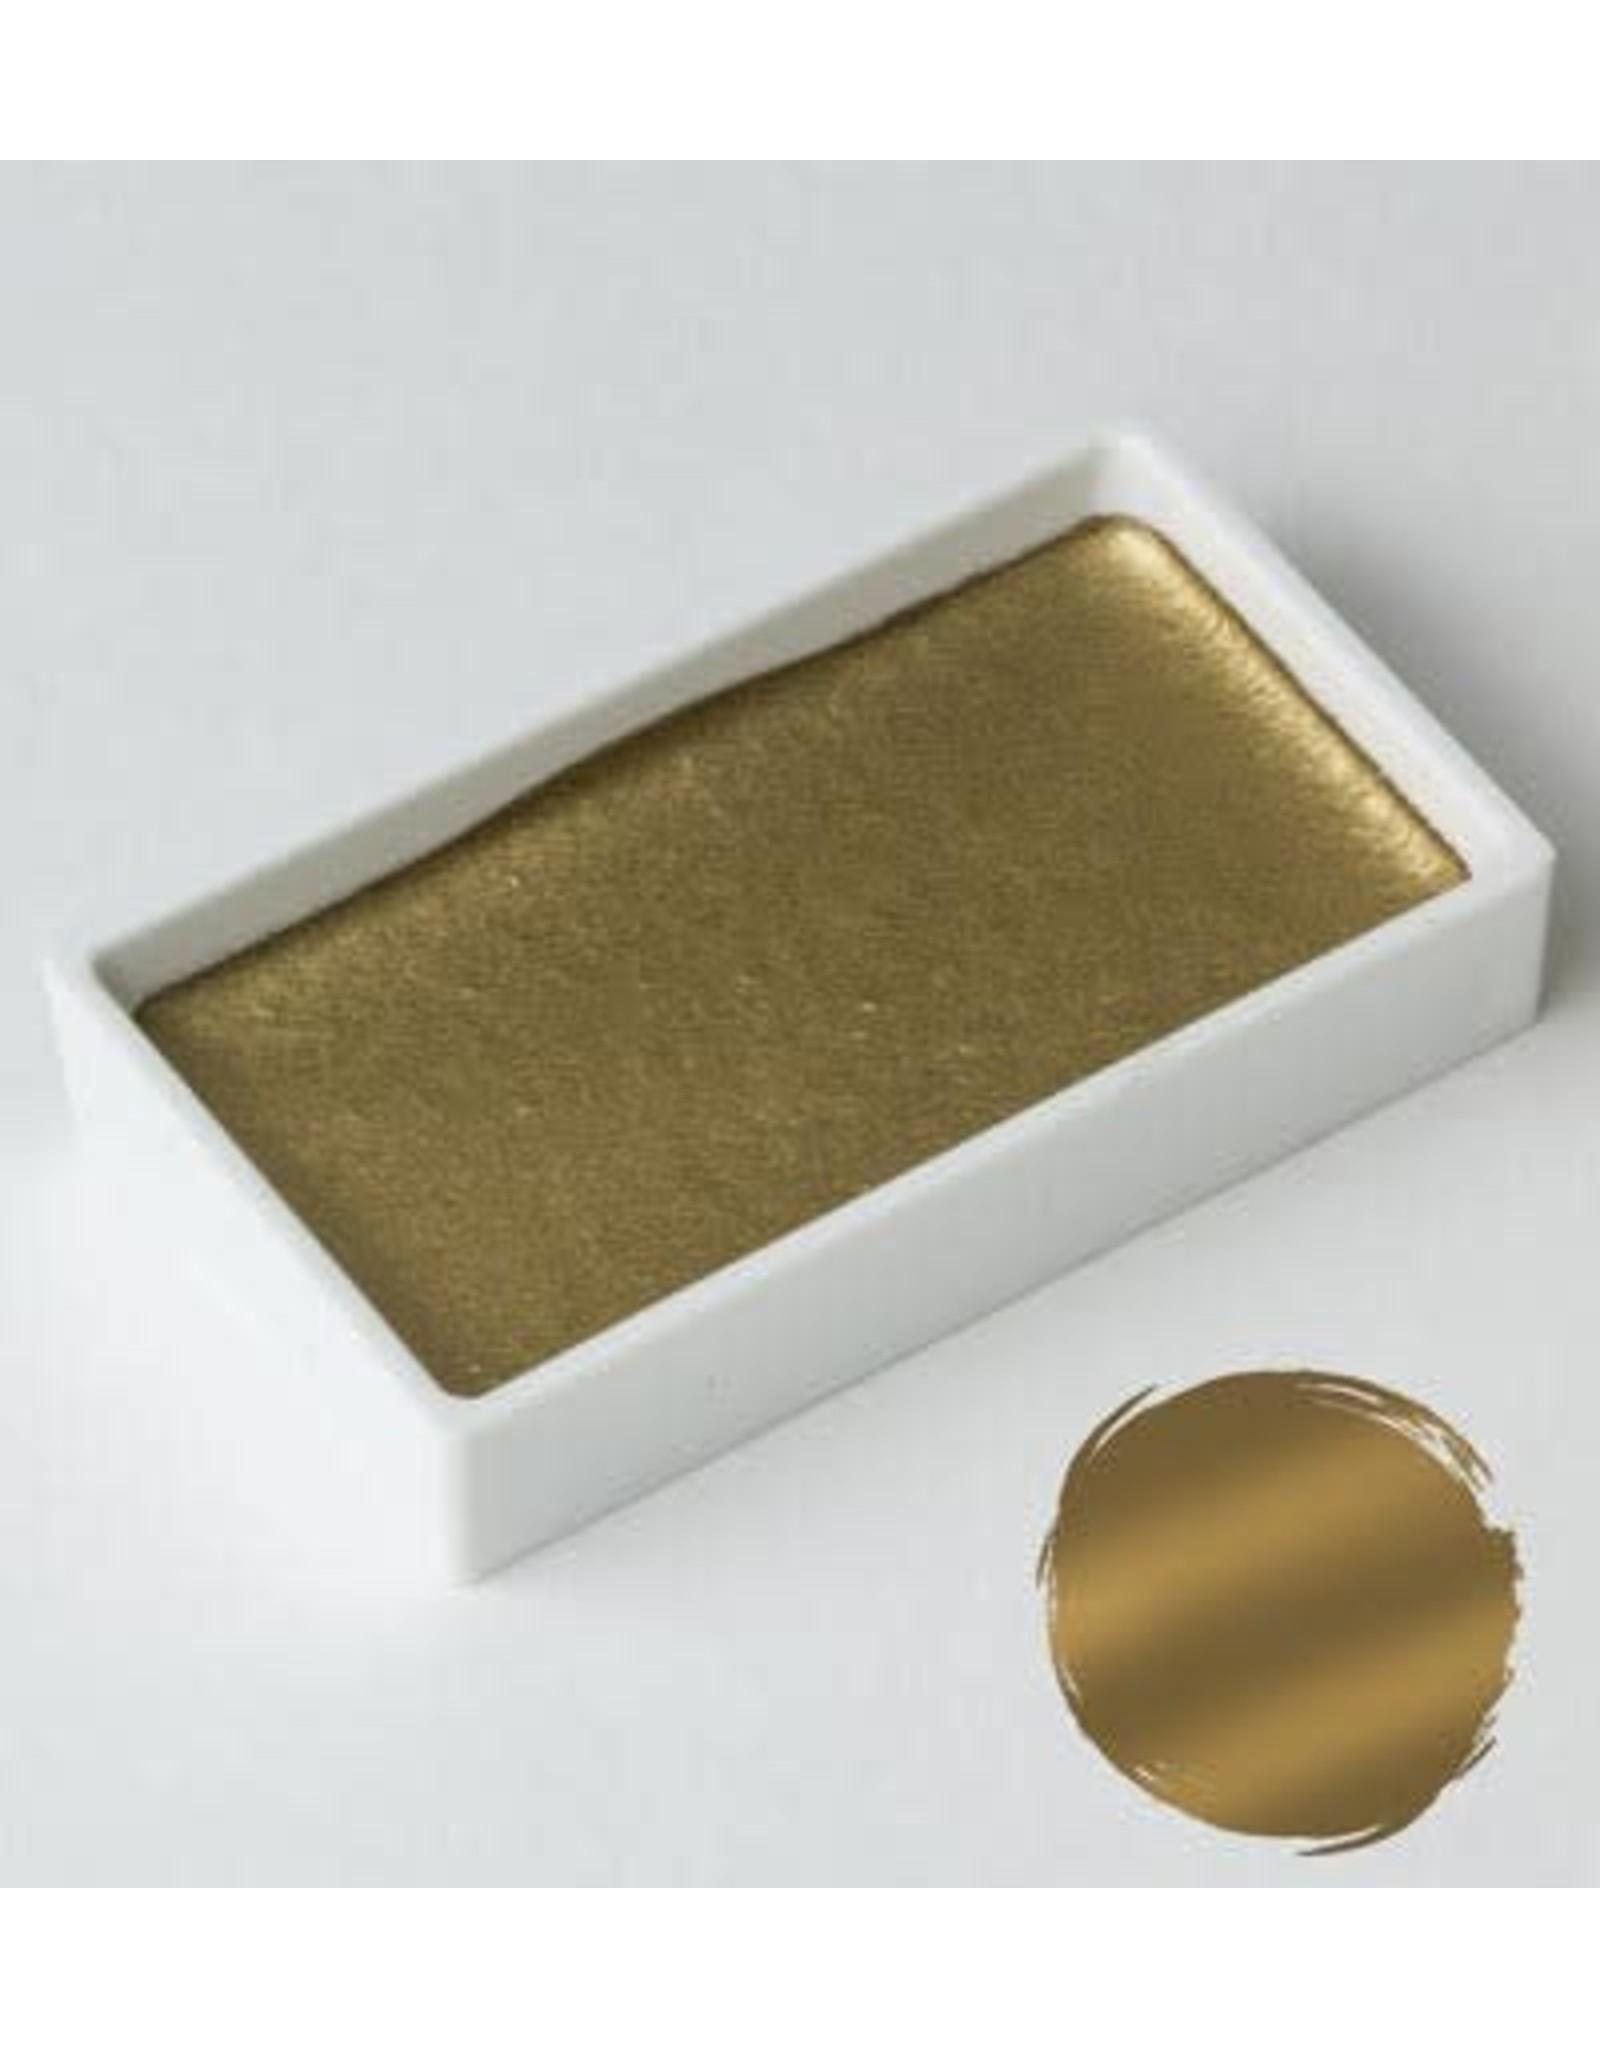 Gansai Tambi Gold